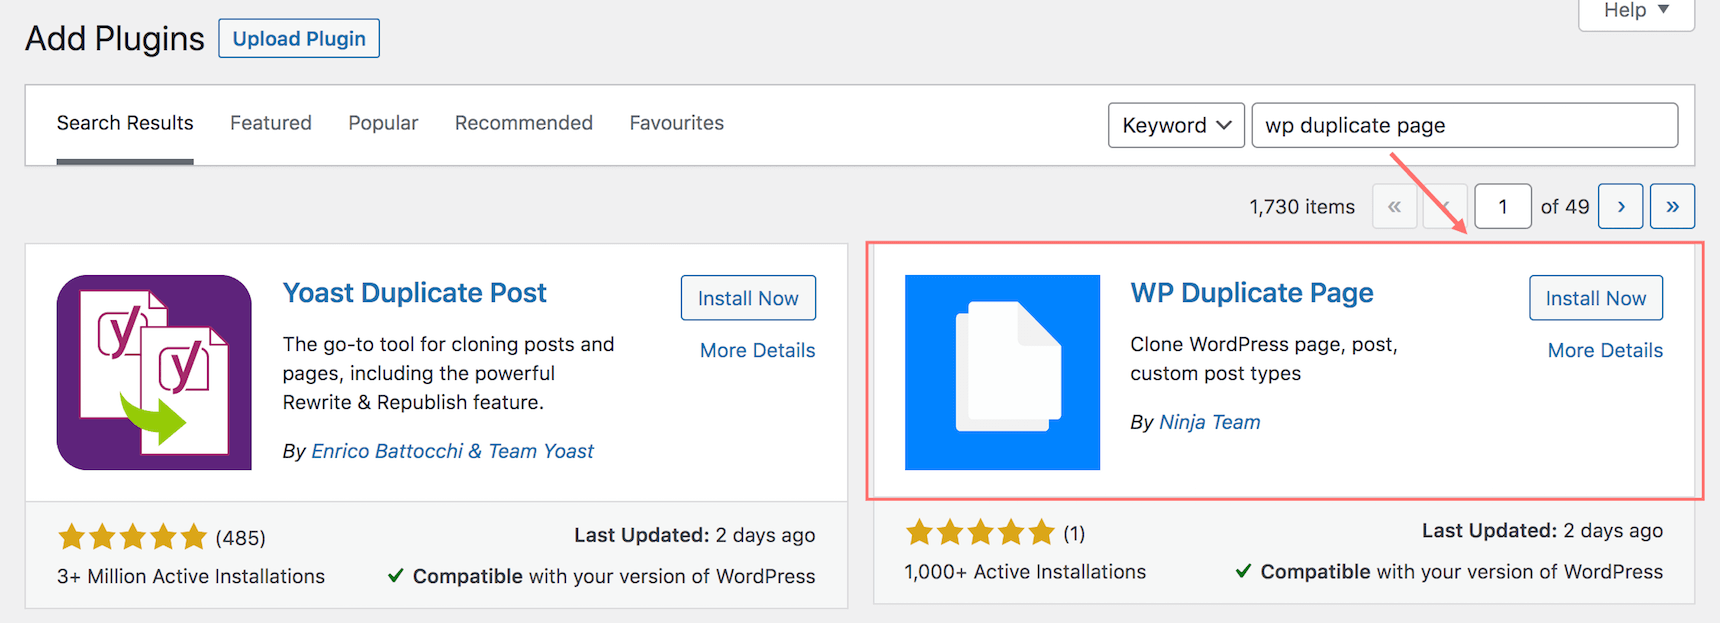 wp duplicate page plugins